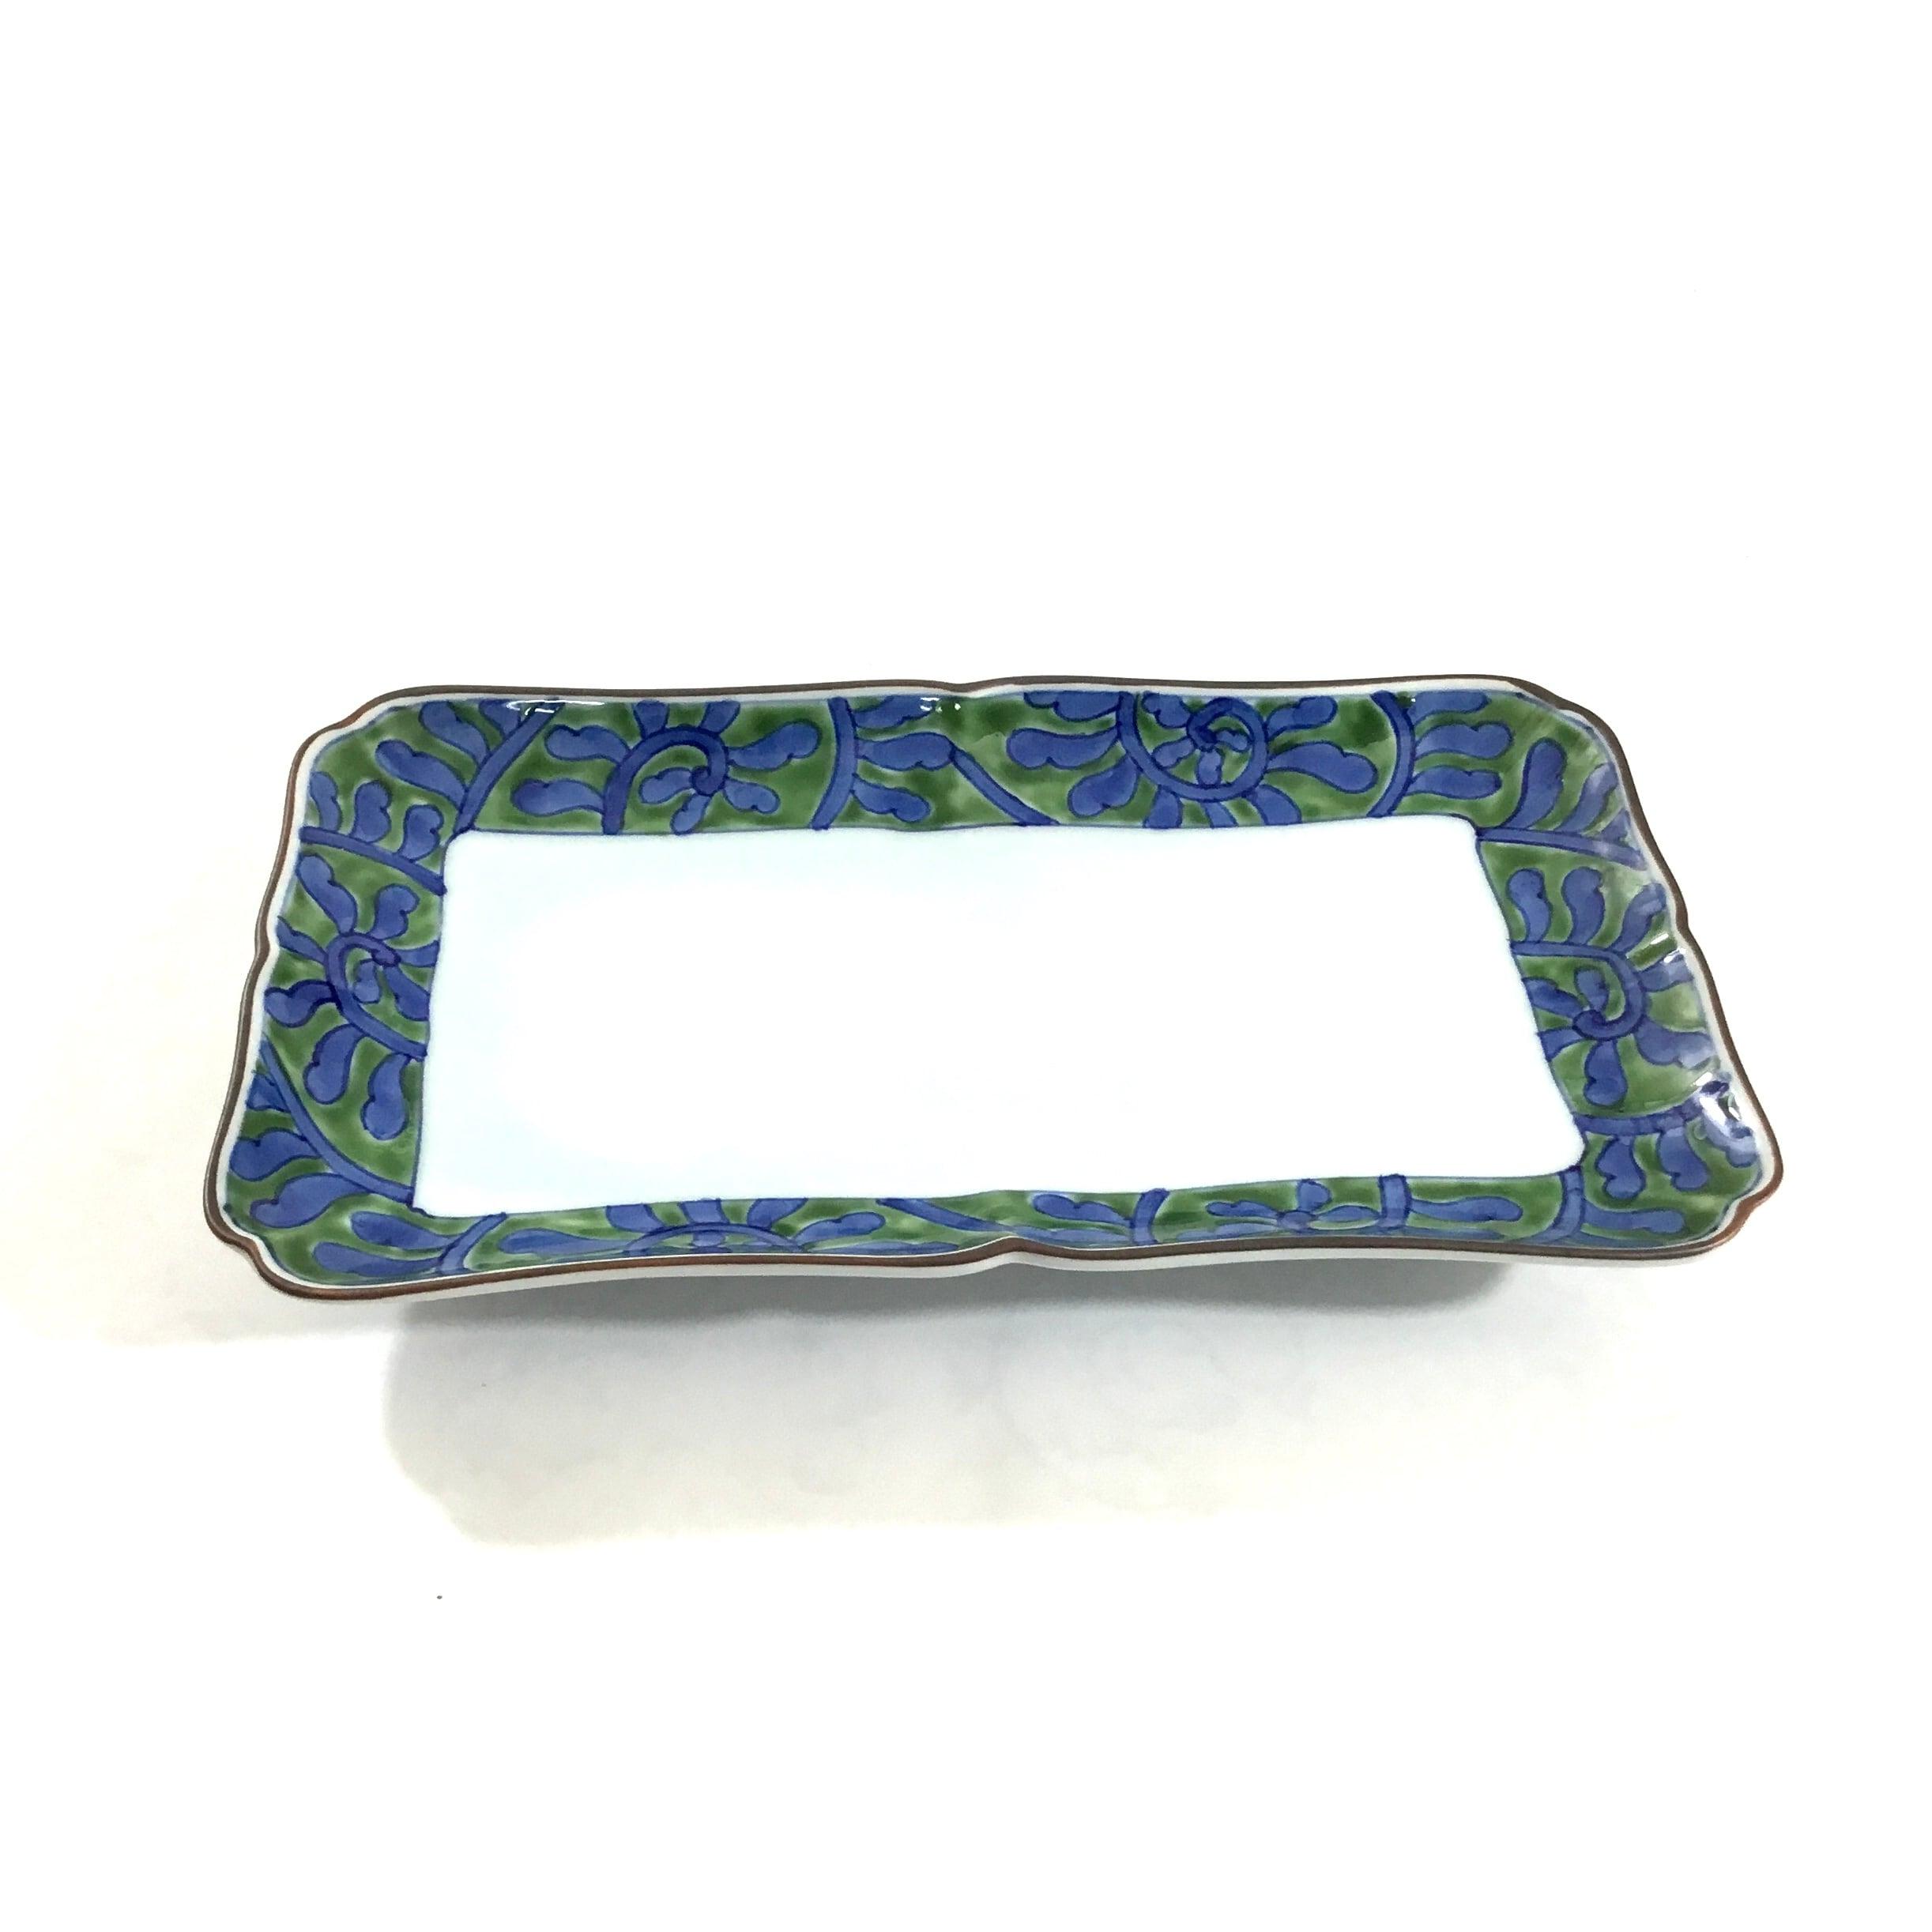 緑彩唐草焼き皿